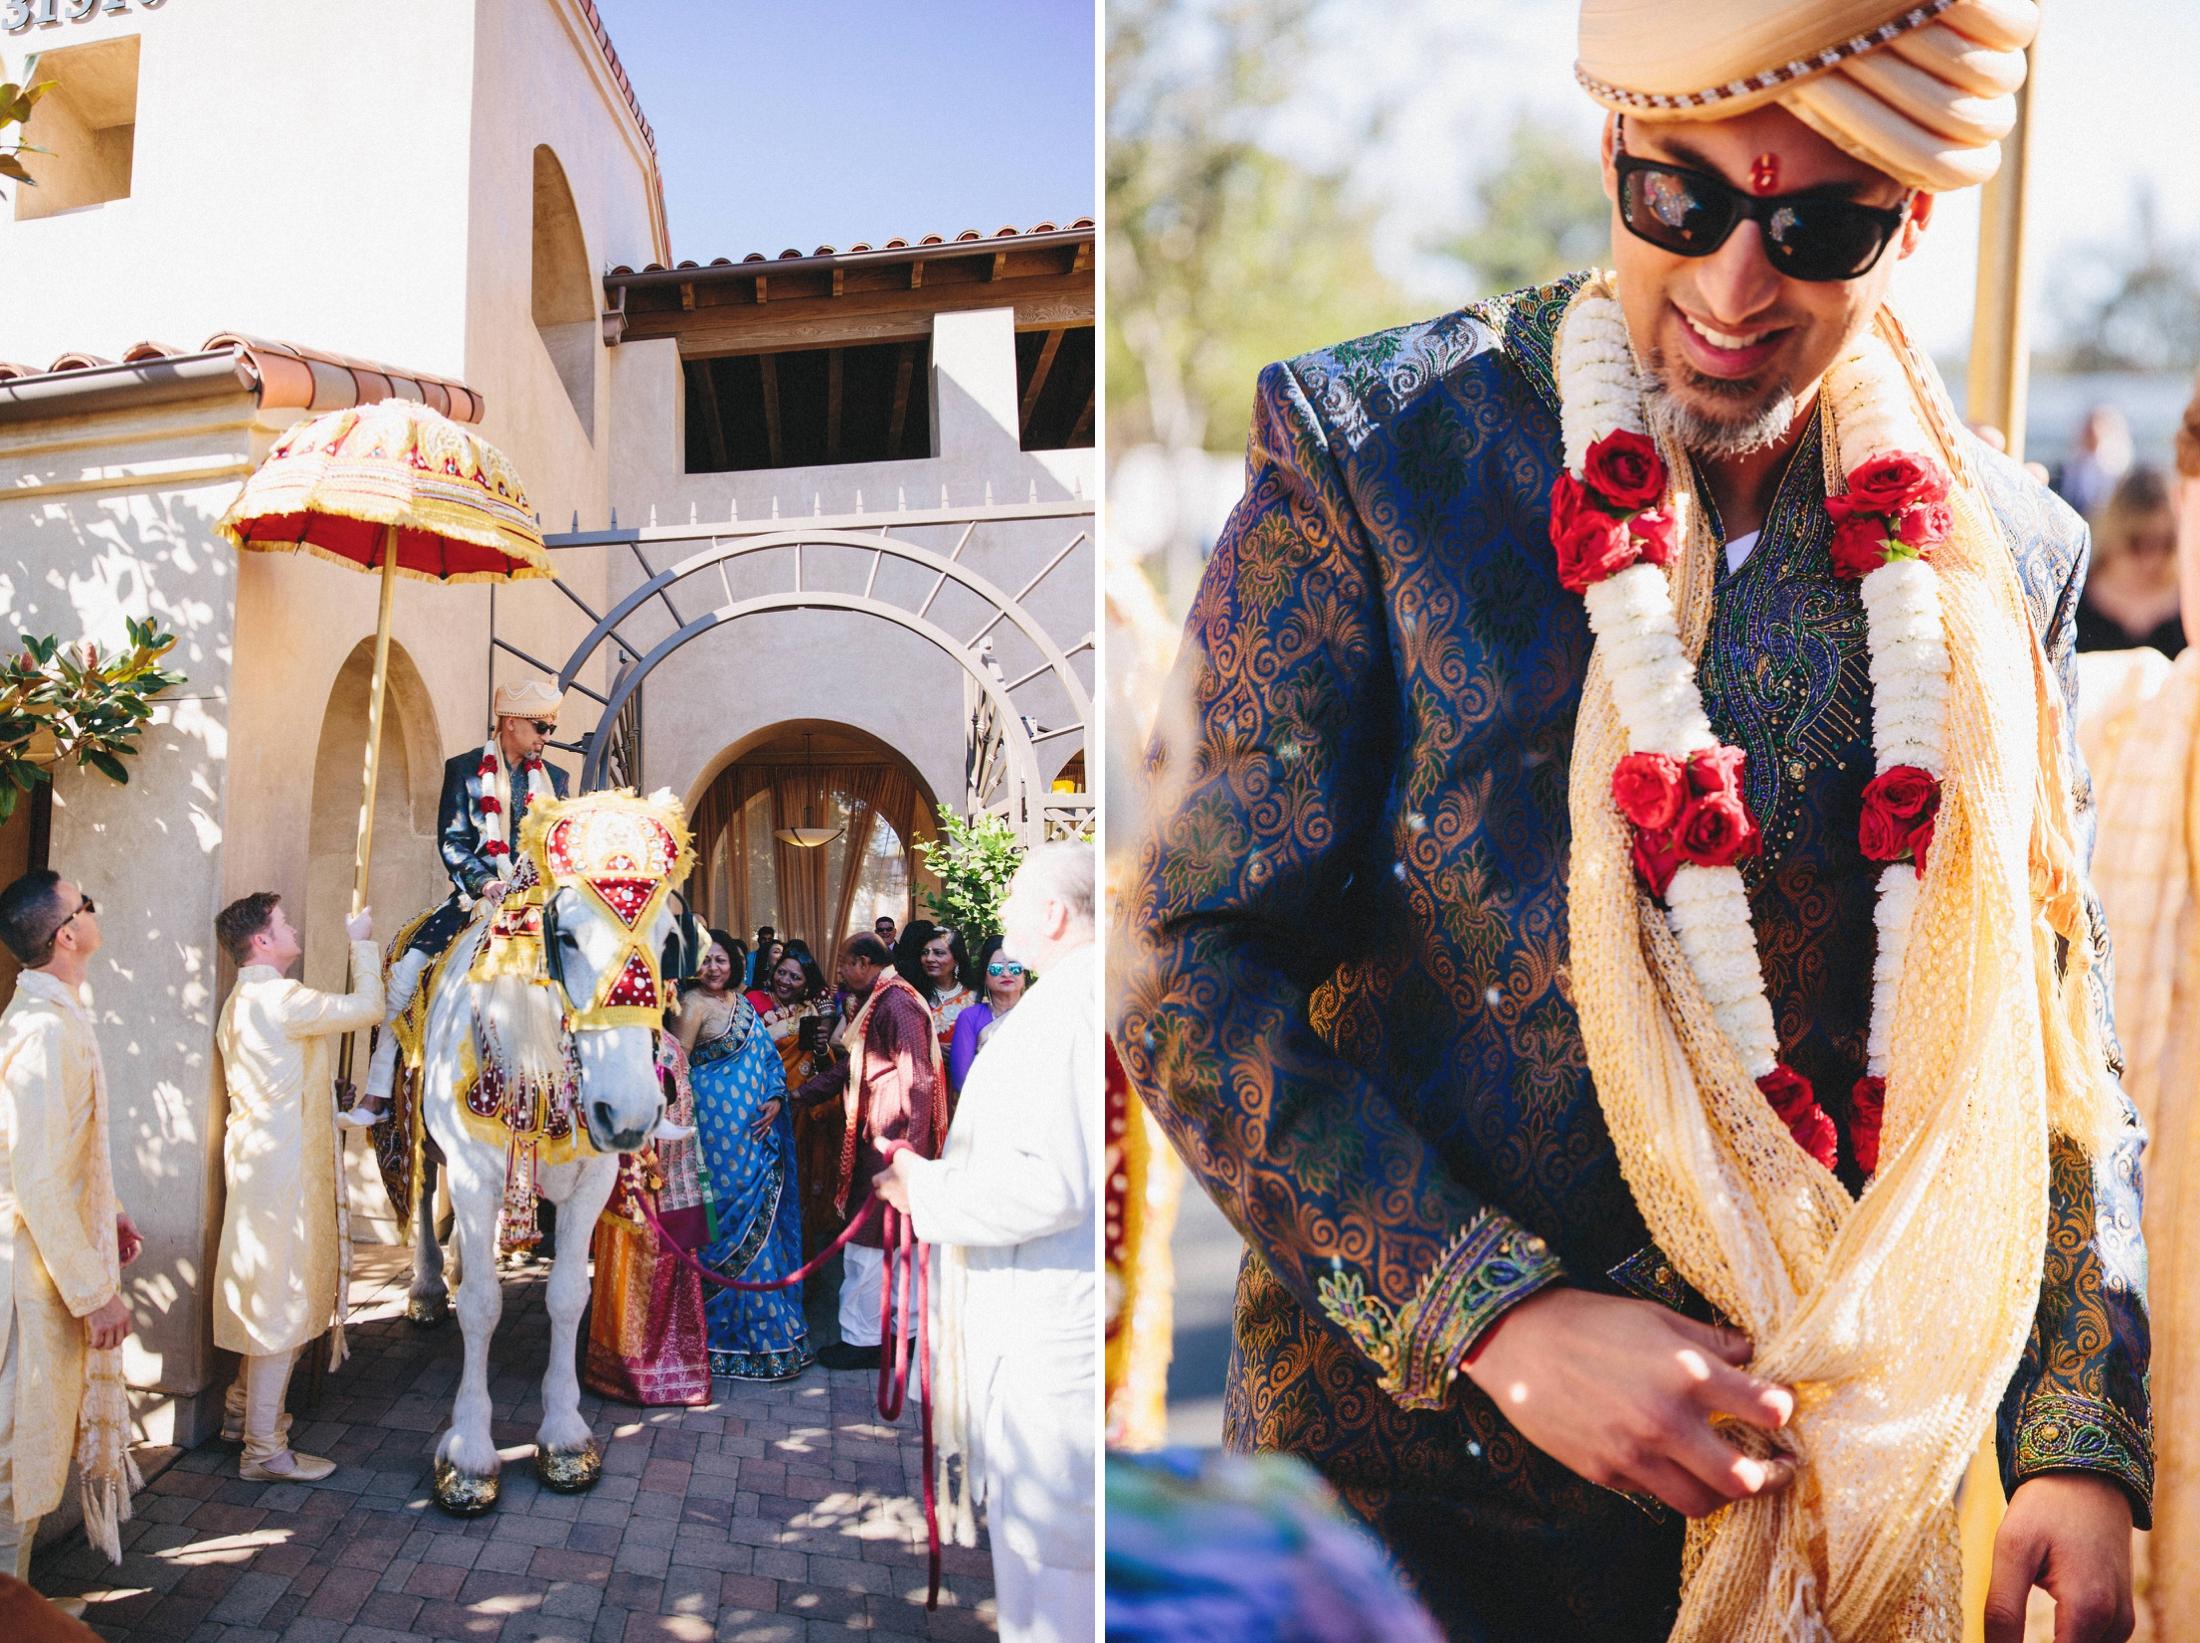 Modern-Indian-Serra-Plaza-wedding-036.jpg